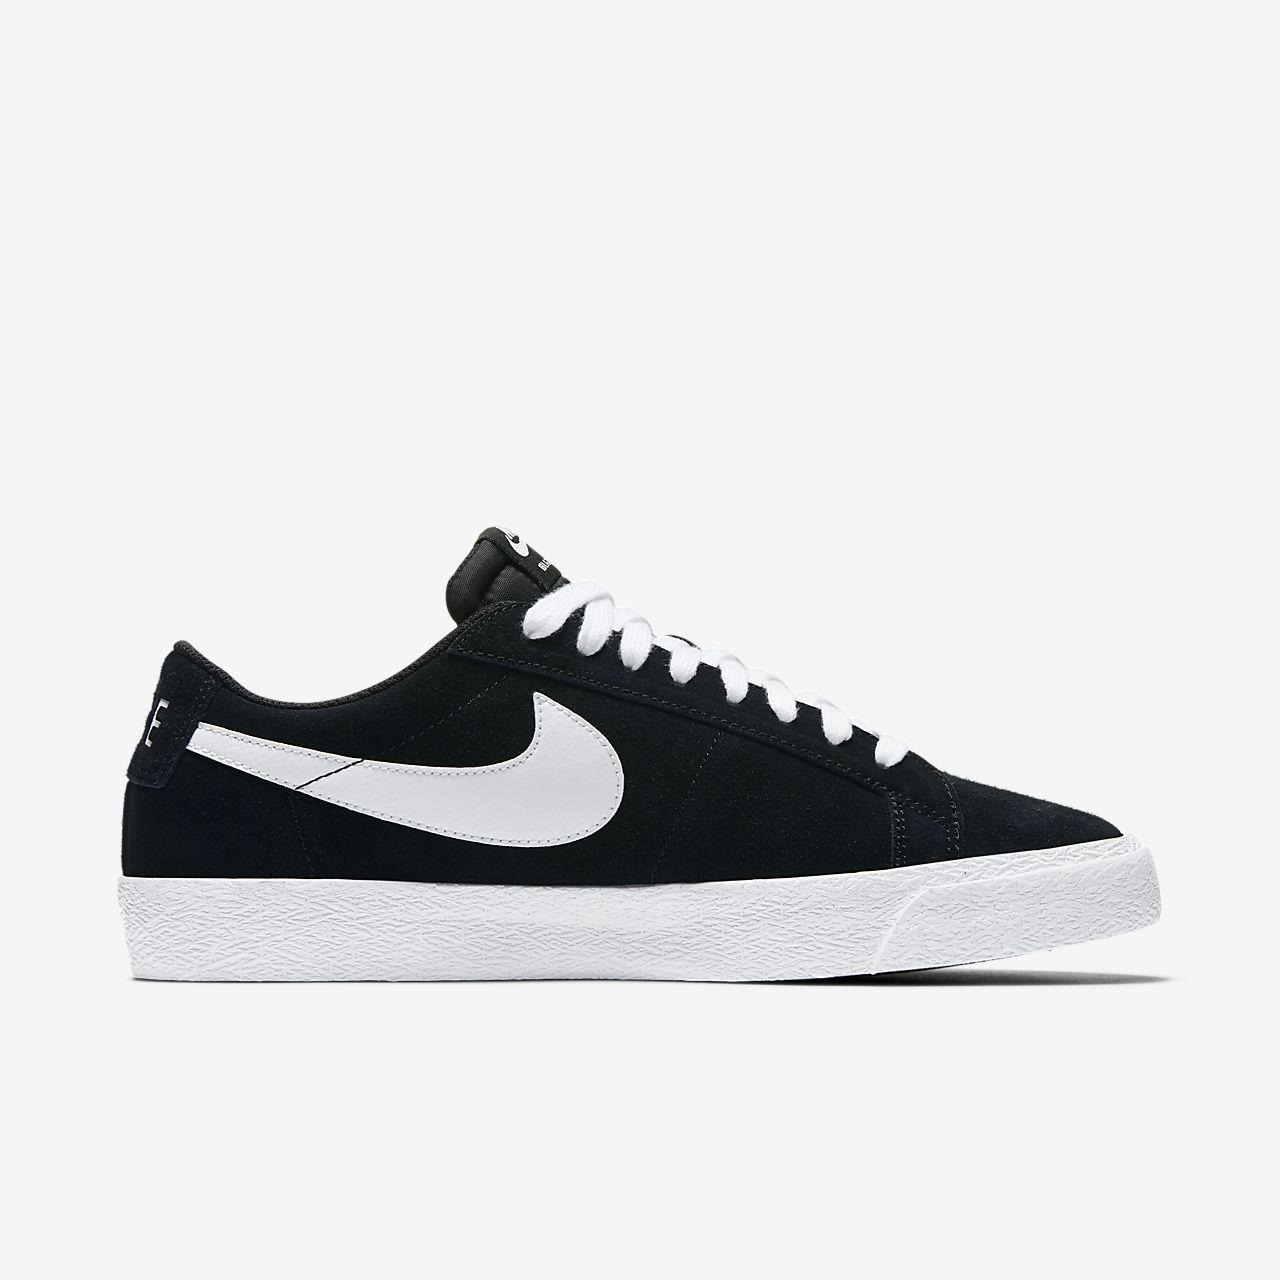 buy online 8e477 1d807 Scarpa da skateboard Nike SB Blazer Zoom Low - Uomo. Nike.com IT